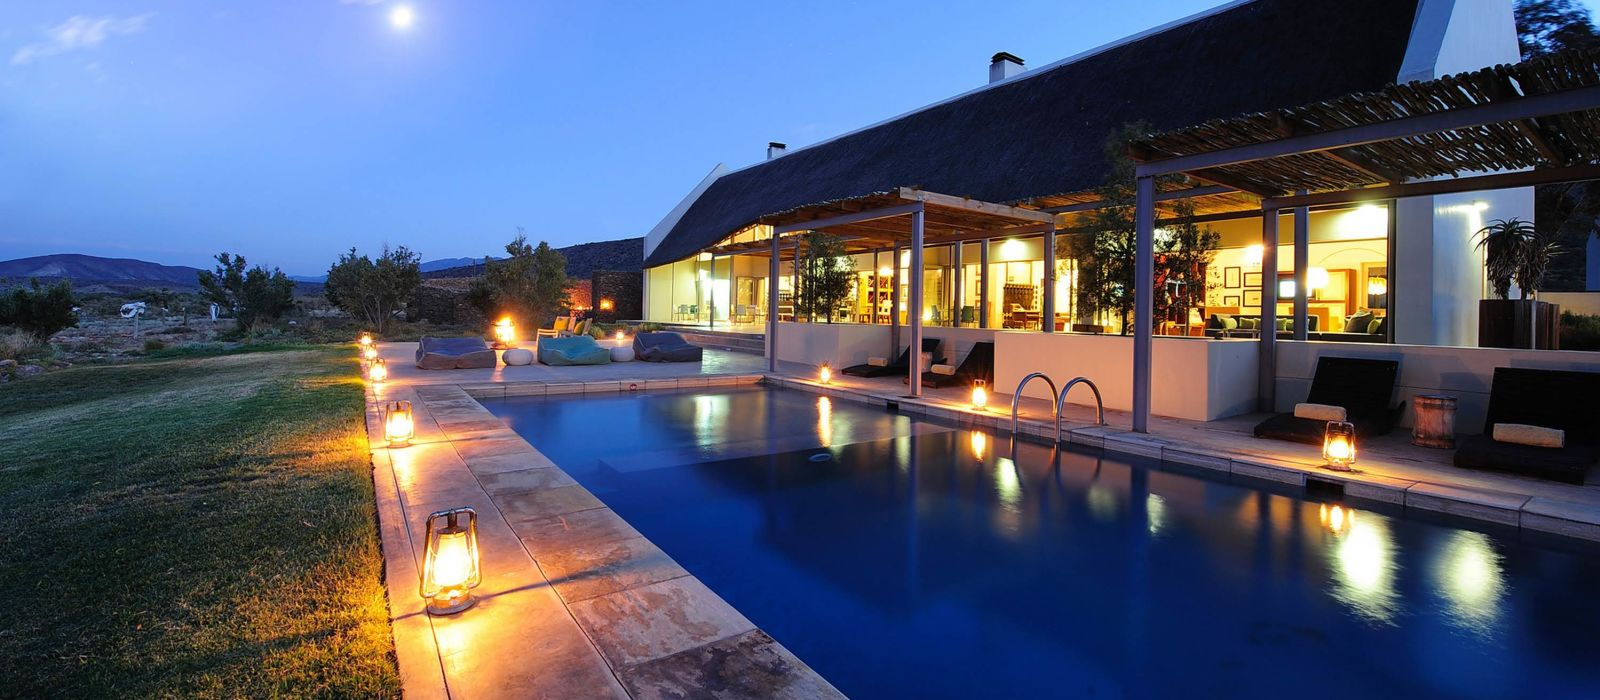 Hotel Sanbona Gondwana Lodge Südafrika